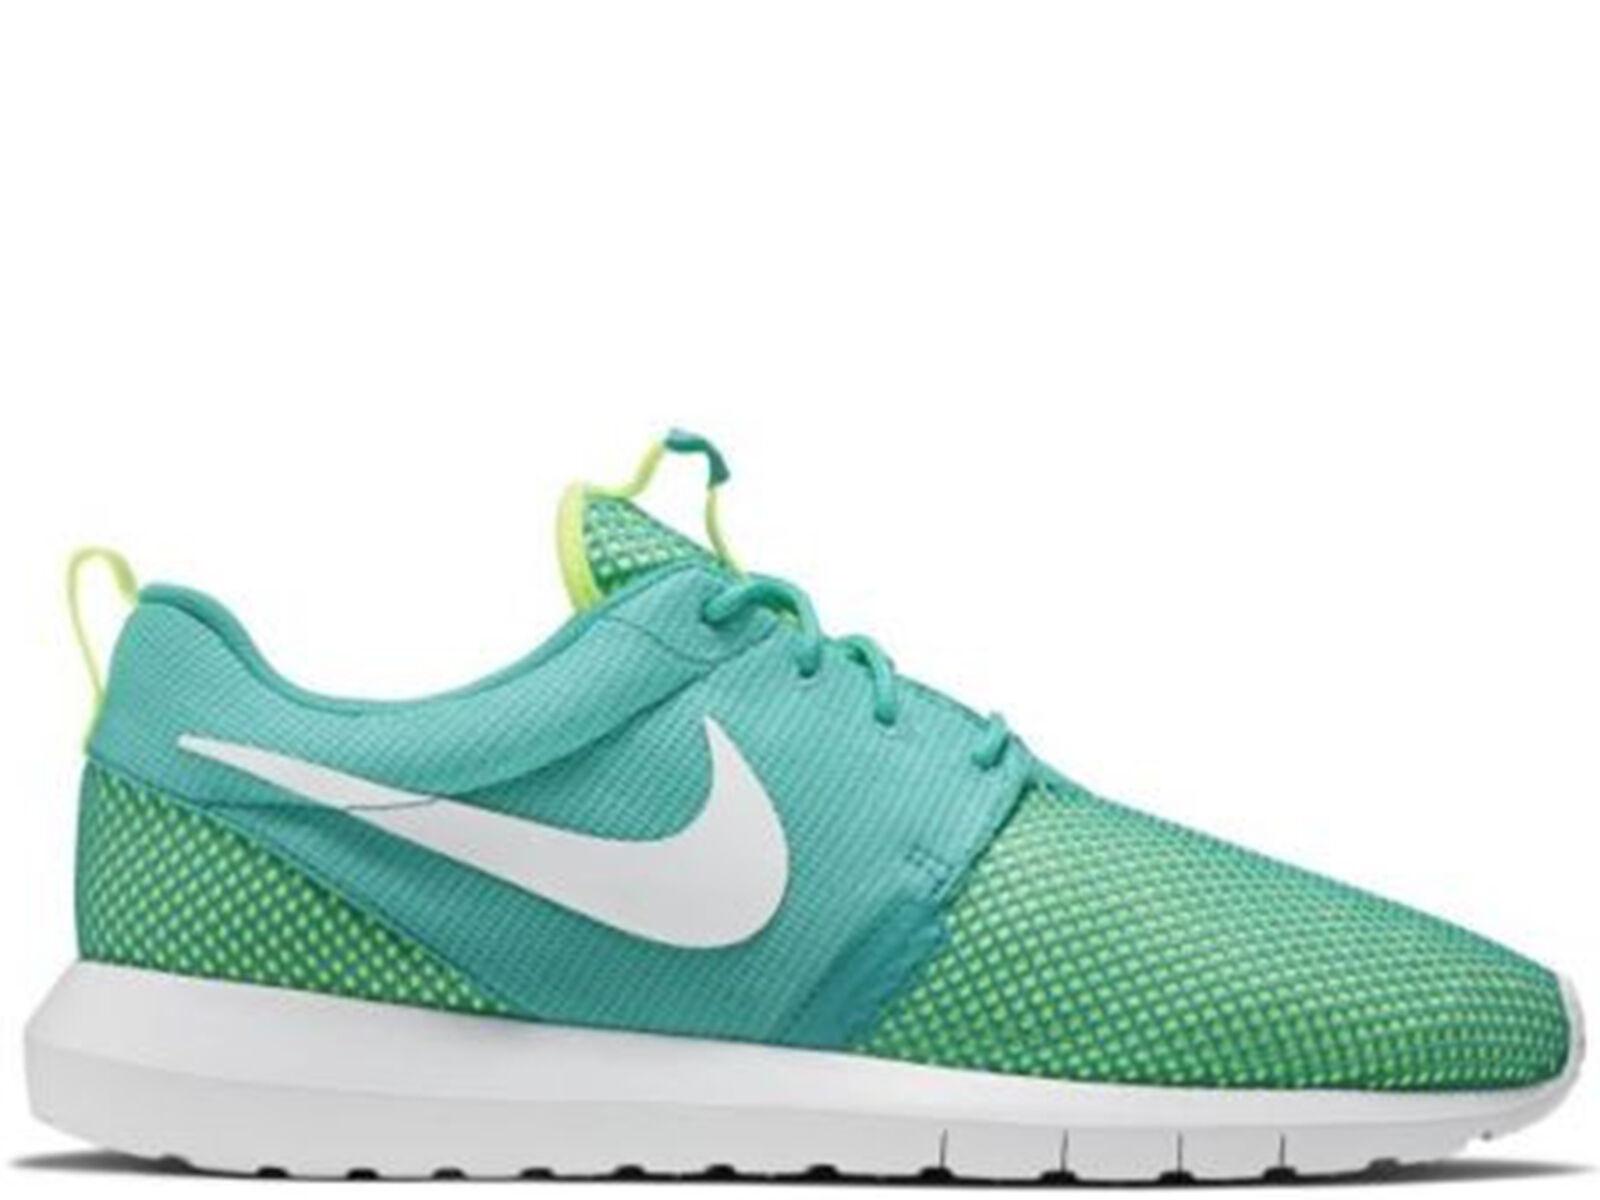 Brand New Nike Rosherun NM BR Men's Athletic Fashion Sneakers [644425 402]